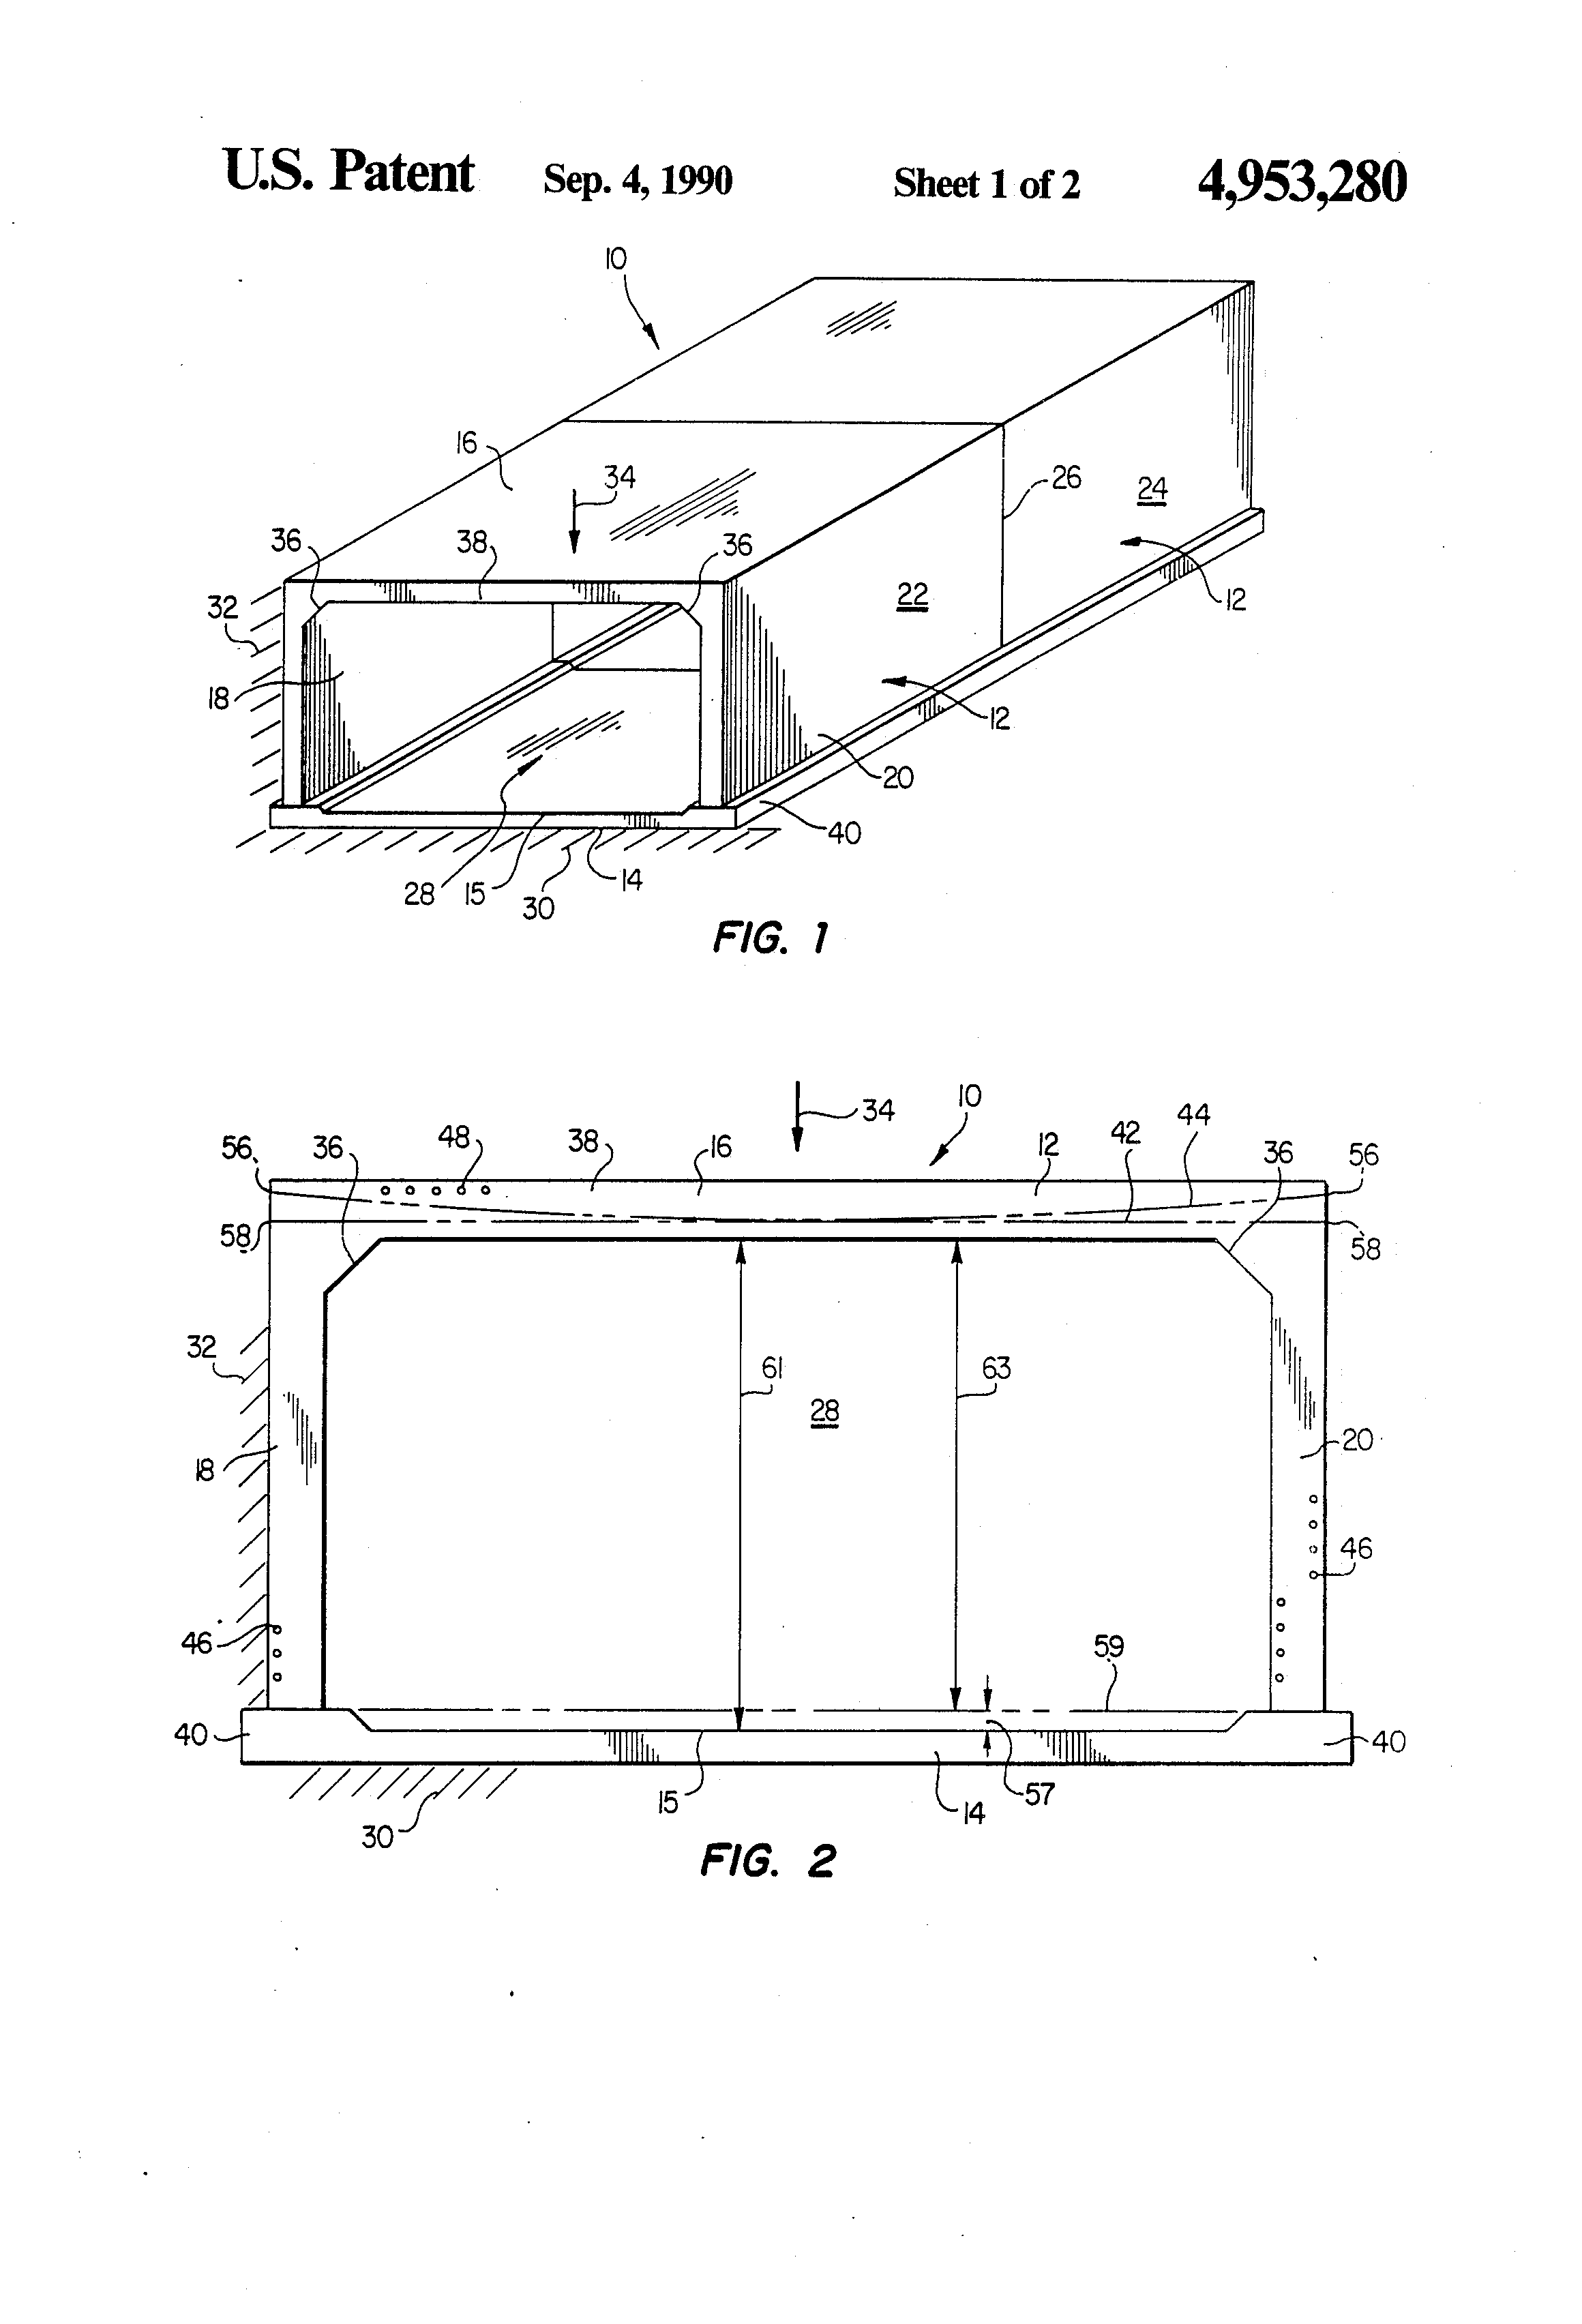 Simple Slab Culvert Design Drawings : ... Method of manufacturing prestressed concrete culverts - Google Patents